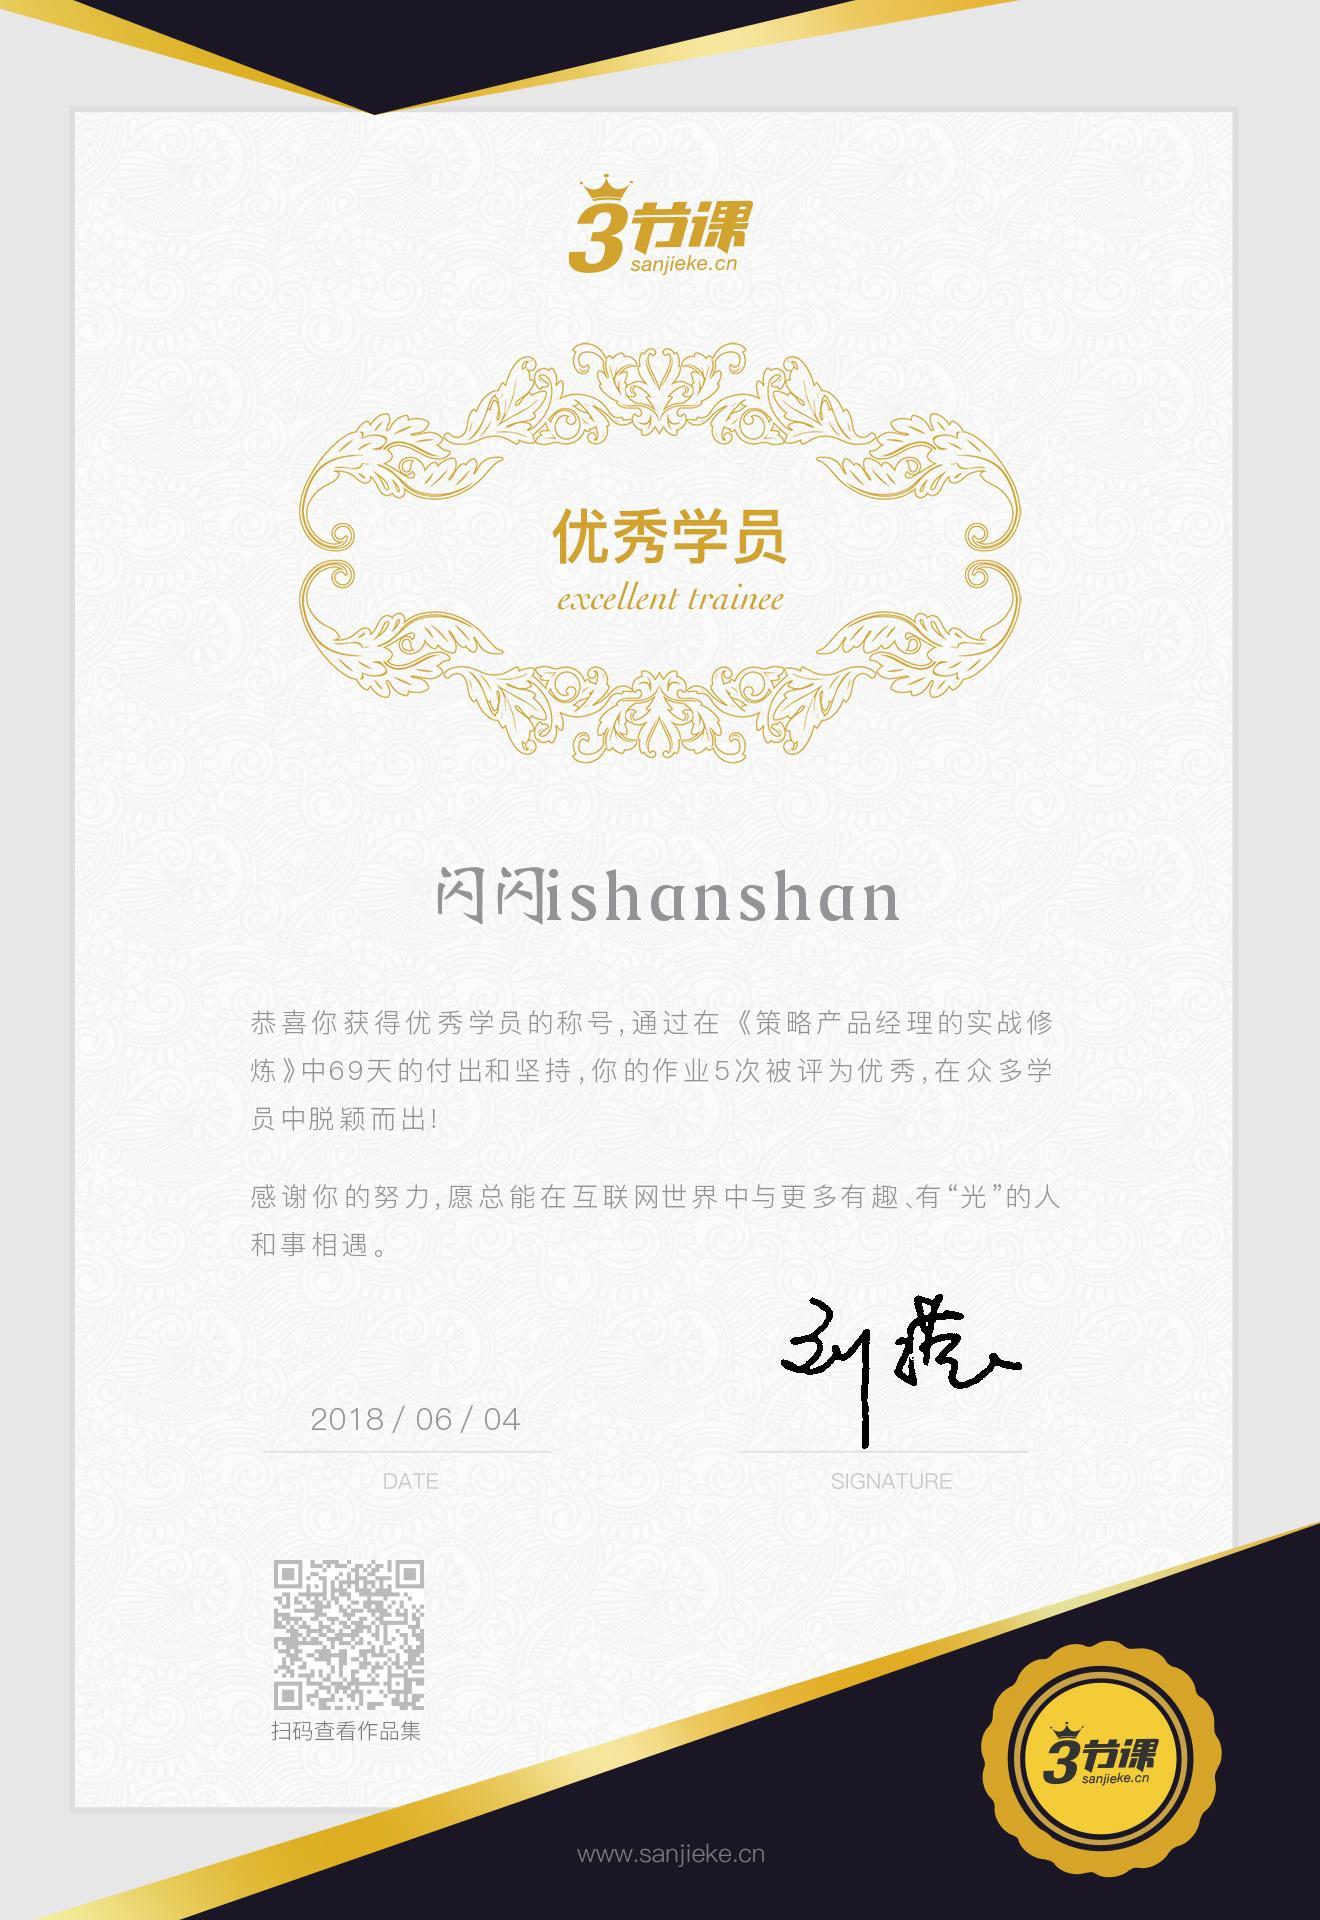 coursespm-certificate.png